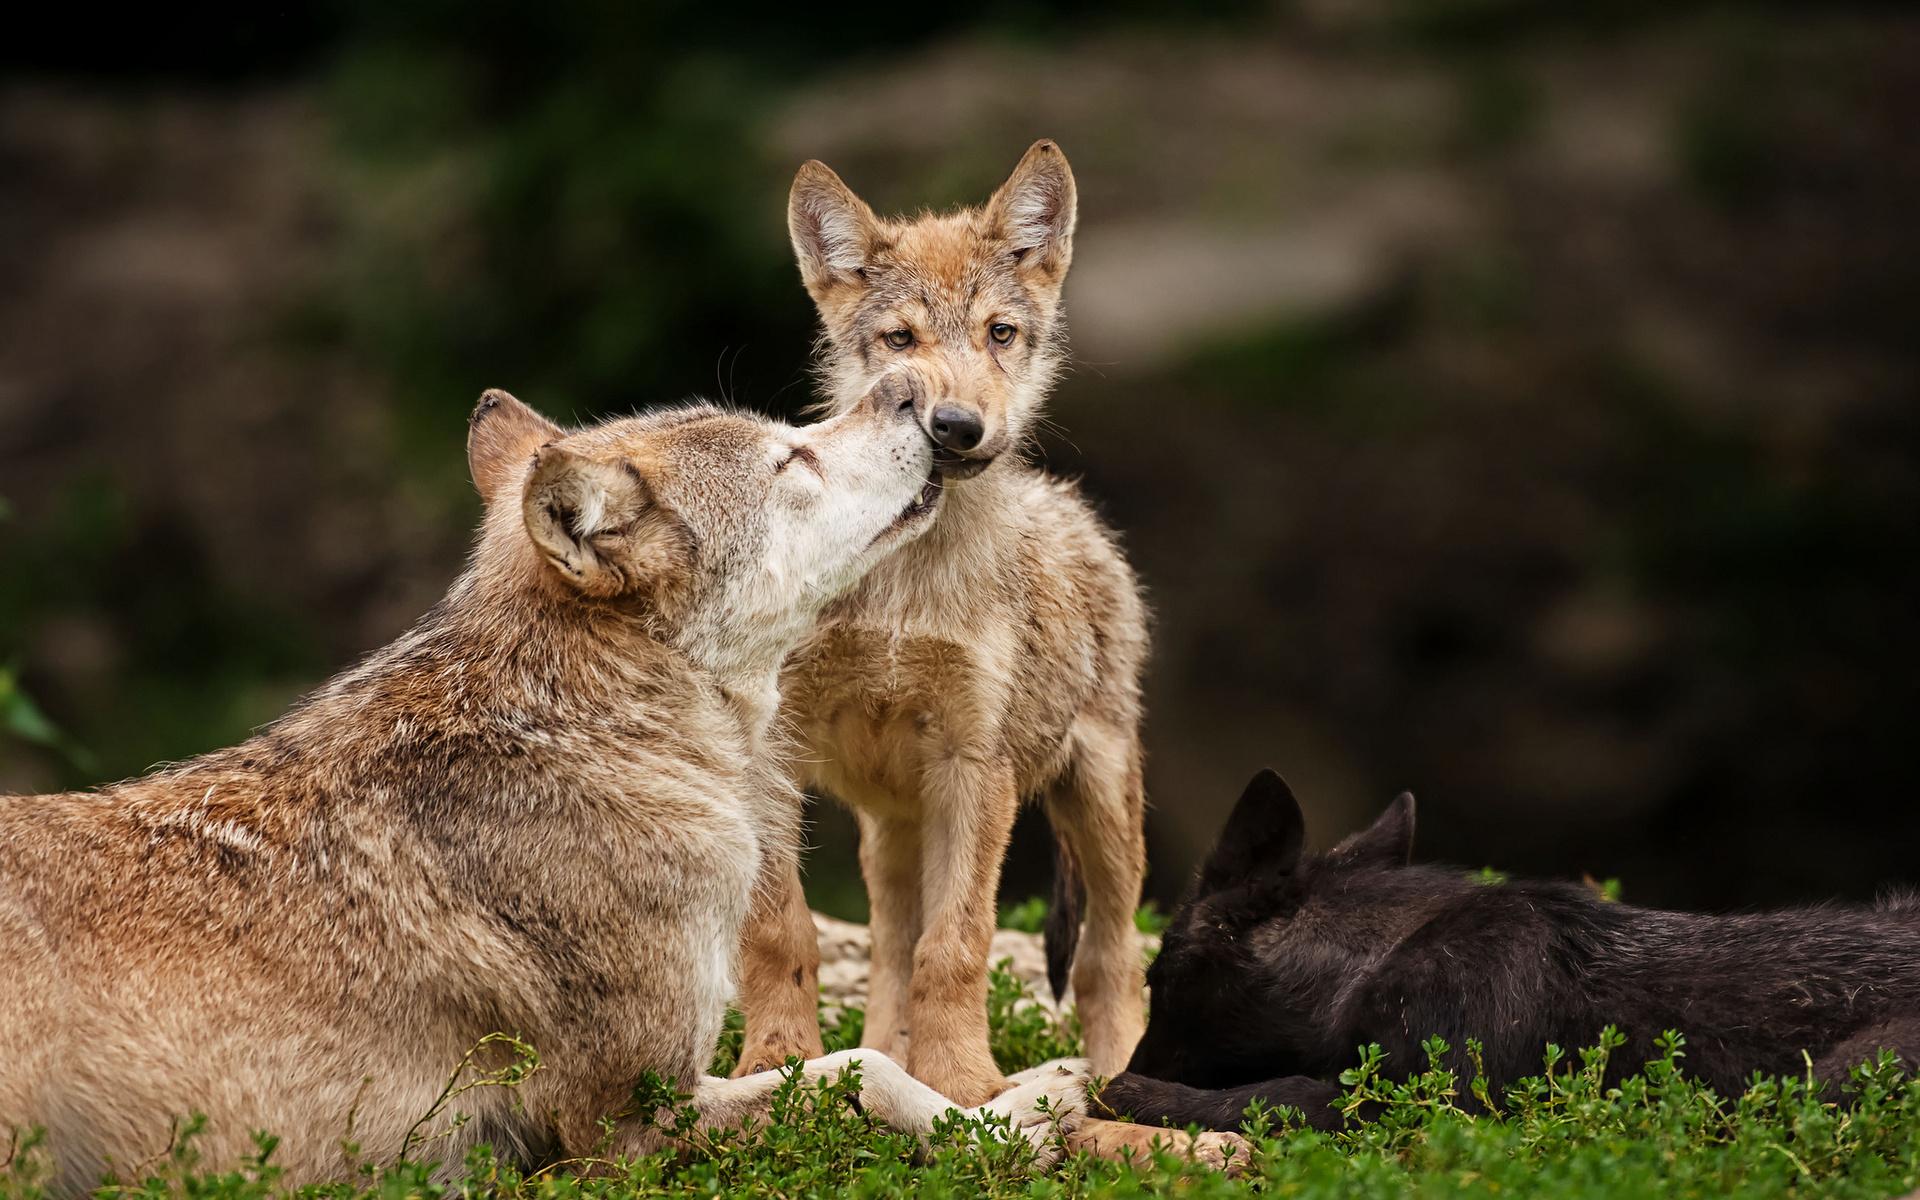 wolf kissing its cub - photo #25